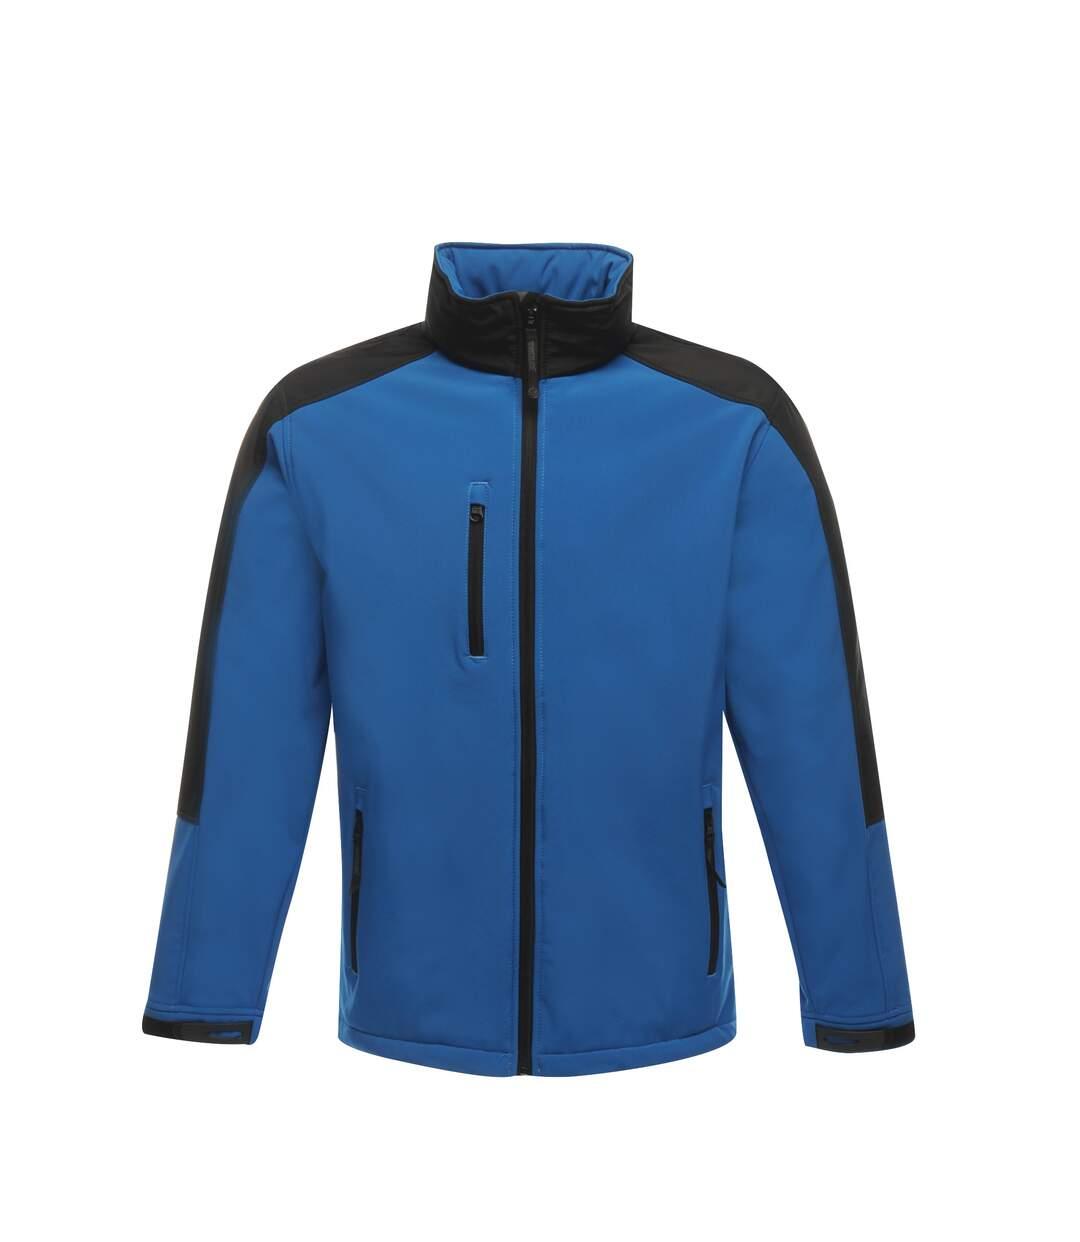 Regatta Hydroforce - Veste Softshell Coupe-Vent - Homme (Bleu marine/Noir) - UTRW1215